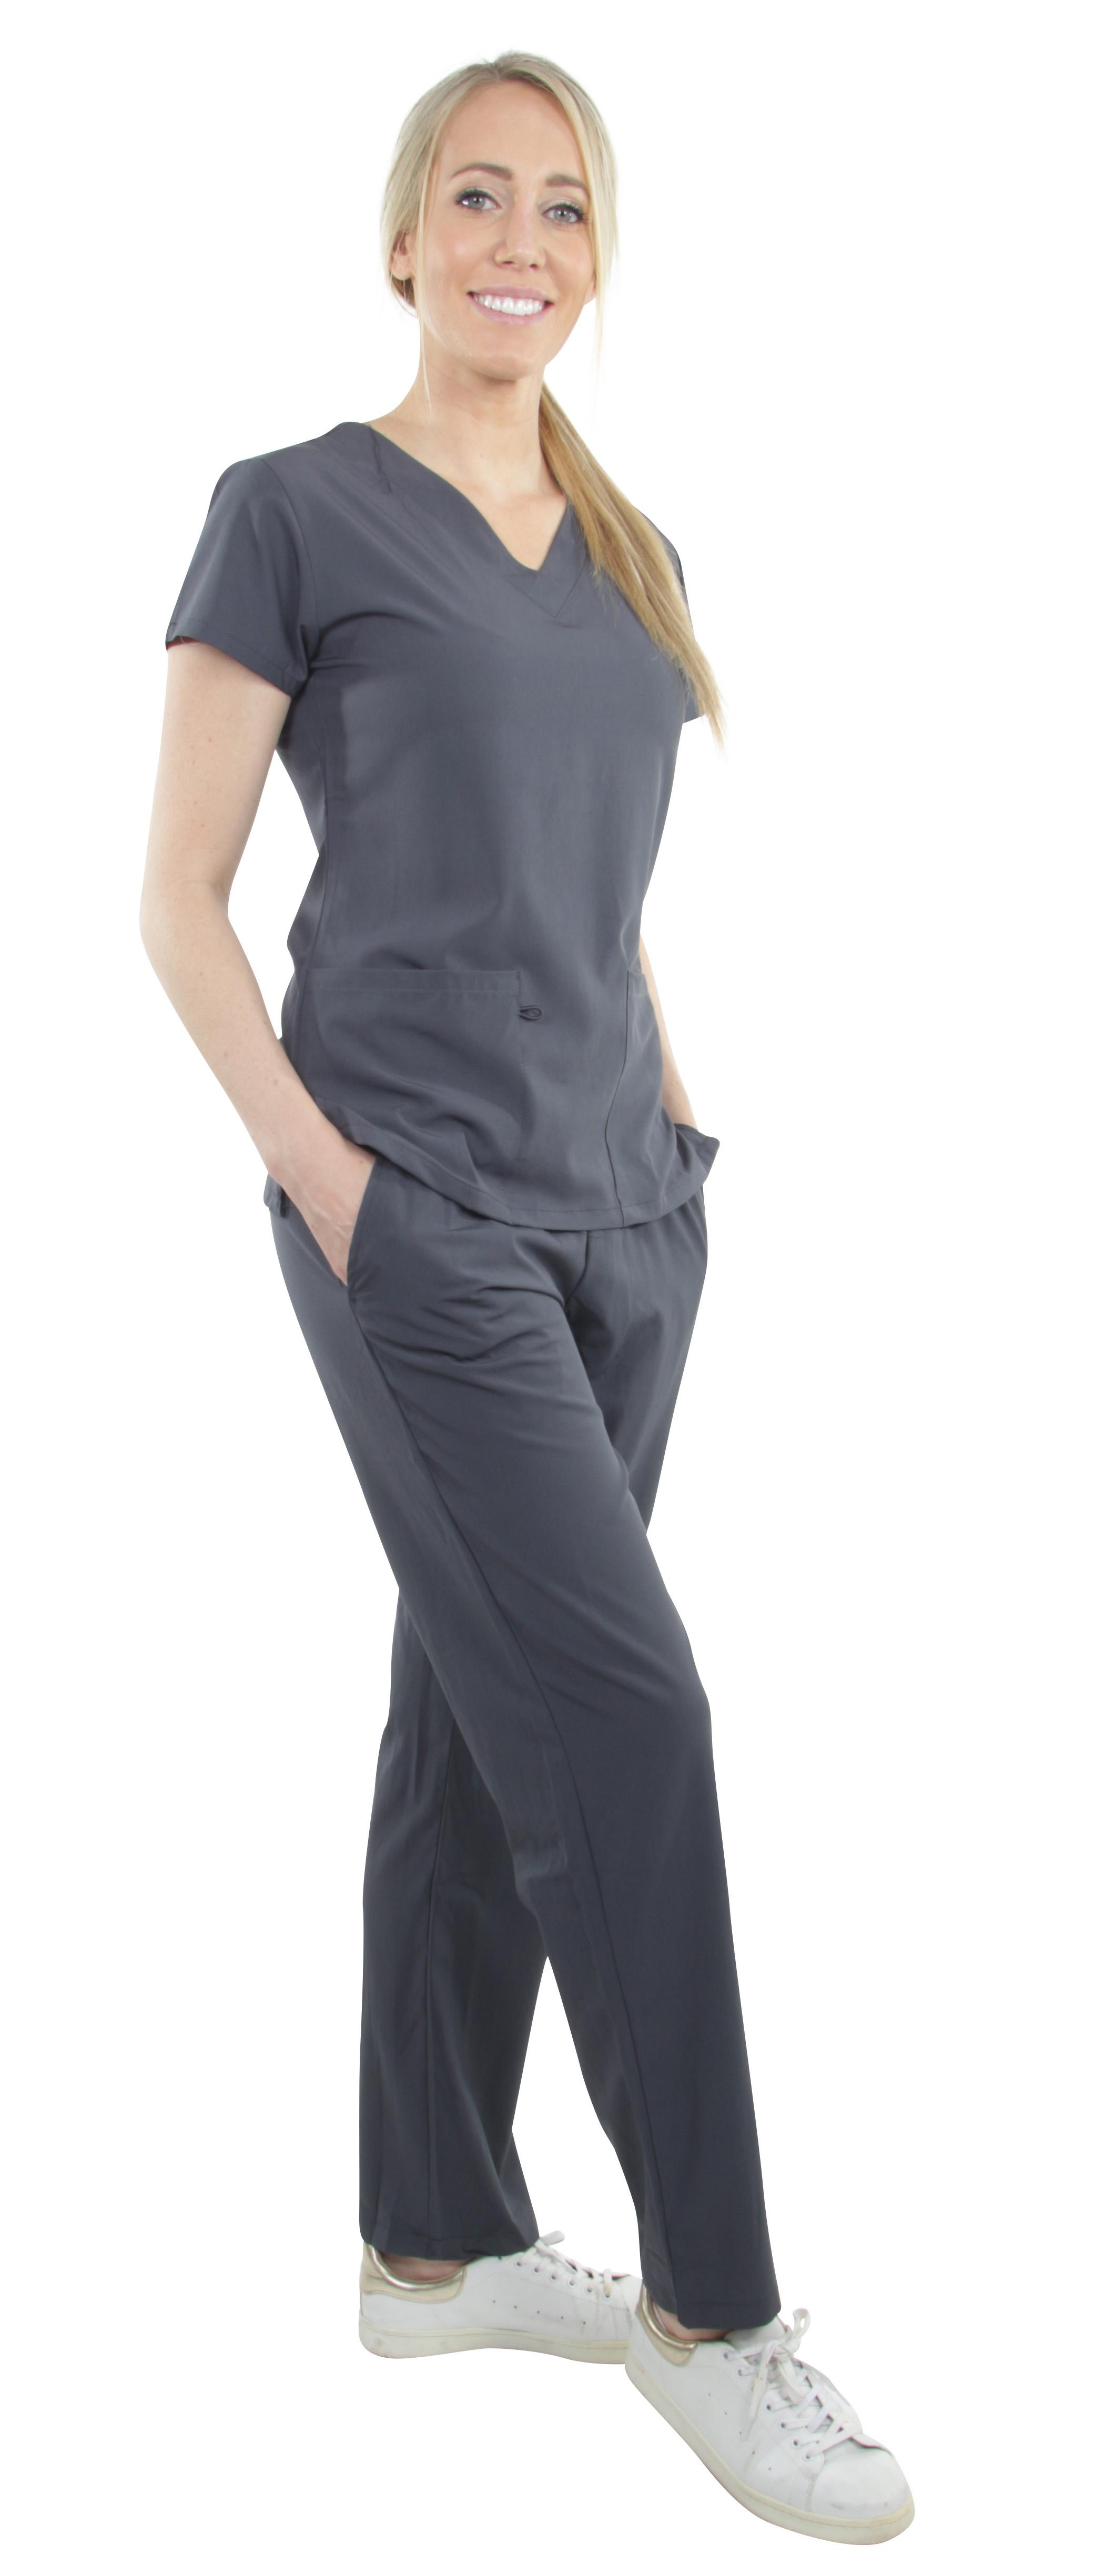 Unisex-Performance-Stretch-Medical-Uniform-Five-Pockets-V-Neck-Scrubs-Sets miniature 46